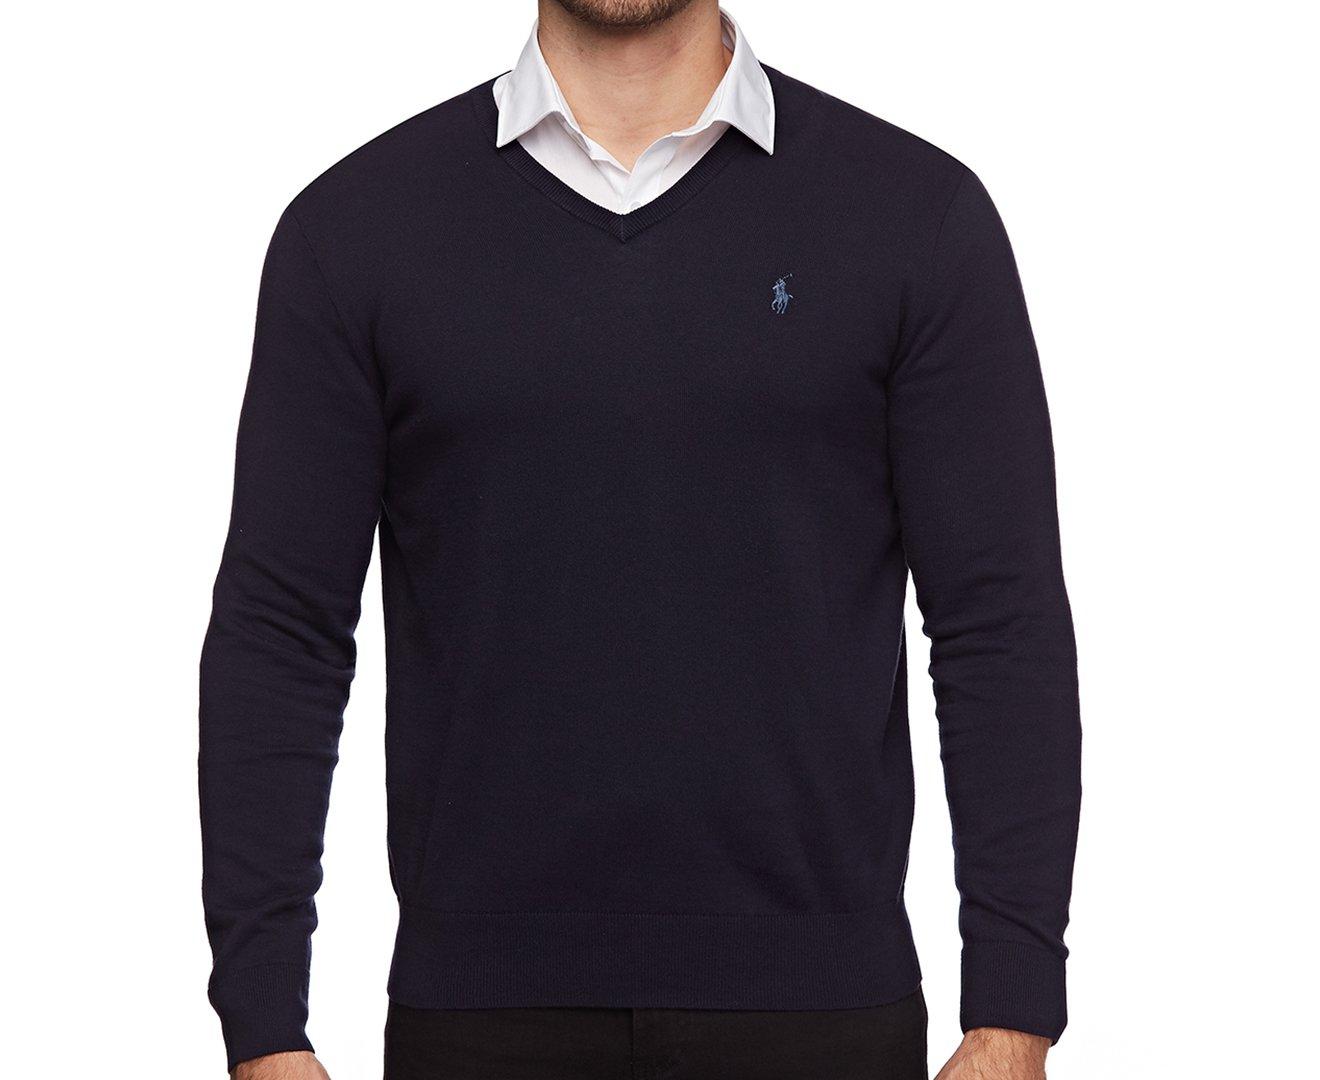 df367384e1df5e Polo Ralph Lauren Mens Pima Cotton V-Neck Sweater FallRoyal, M at Amazon  Men's